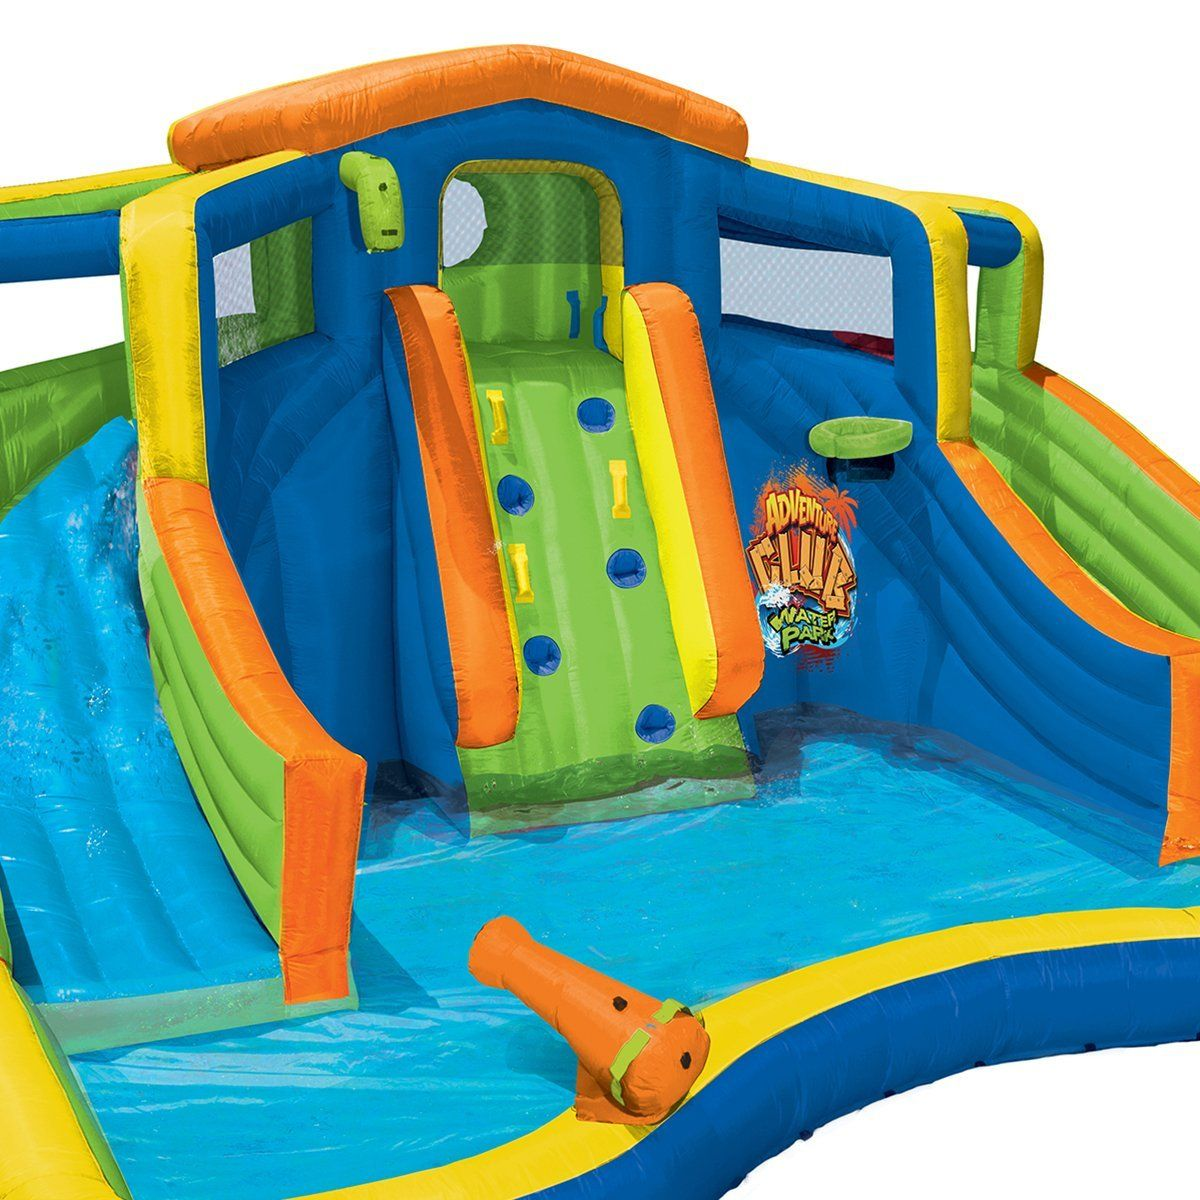 Banzai Inflatable Adventure Club Dual Slide And Pool Backyard Water Park Backyard Water Parks Inflatable Water Park Backyard Pool